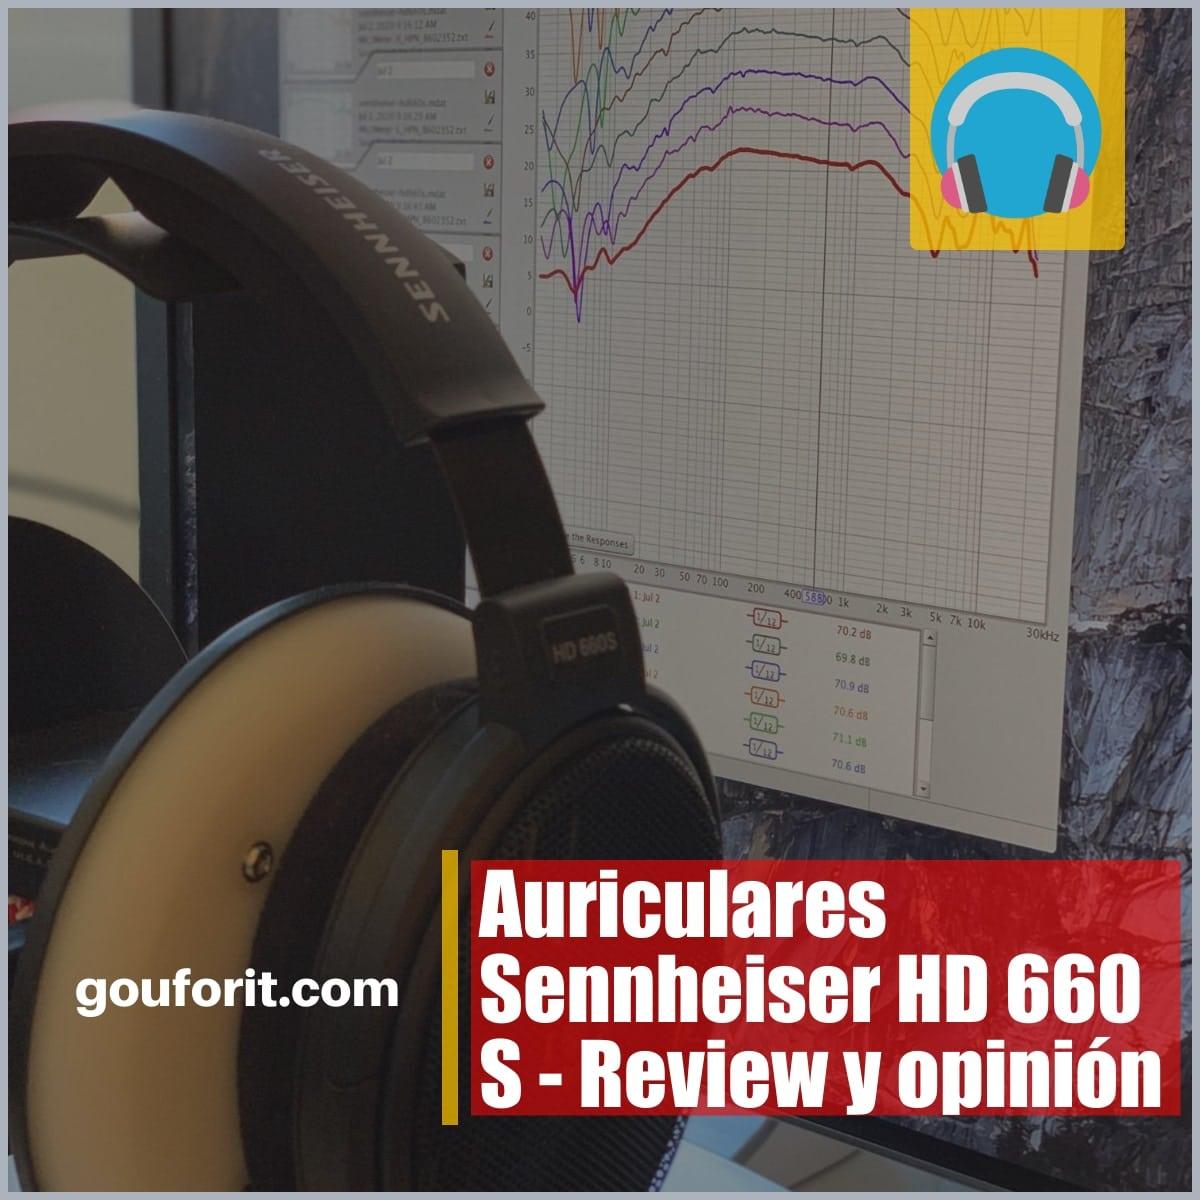 Auriculares Sennheiser HD 660 S - Review y opinión